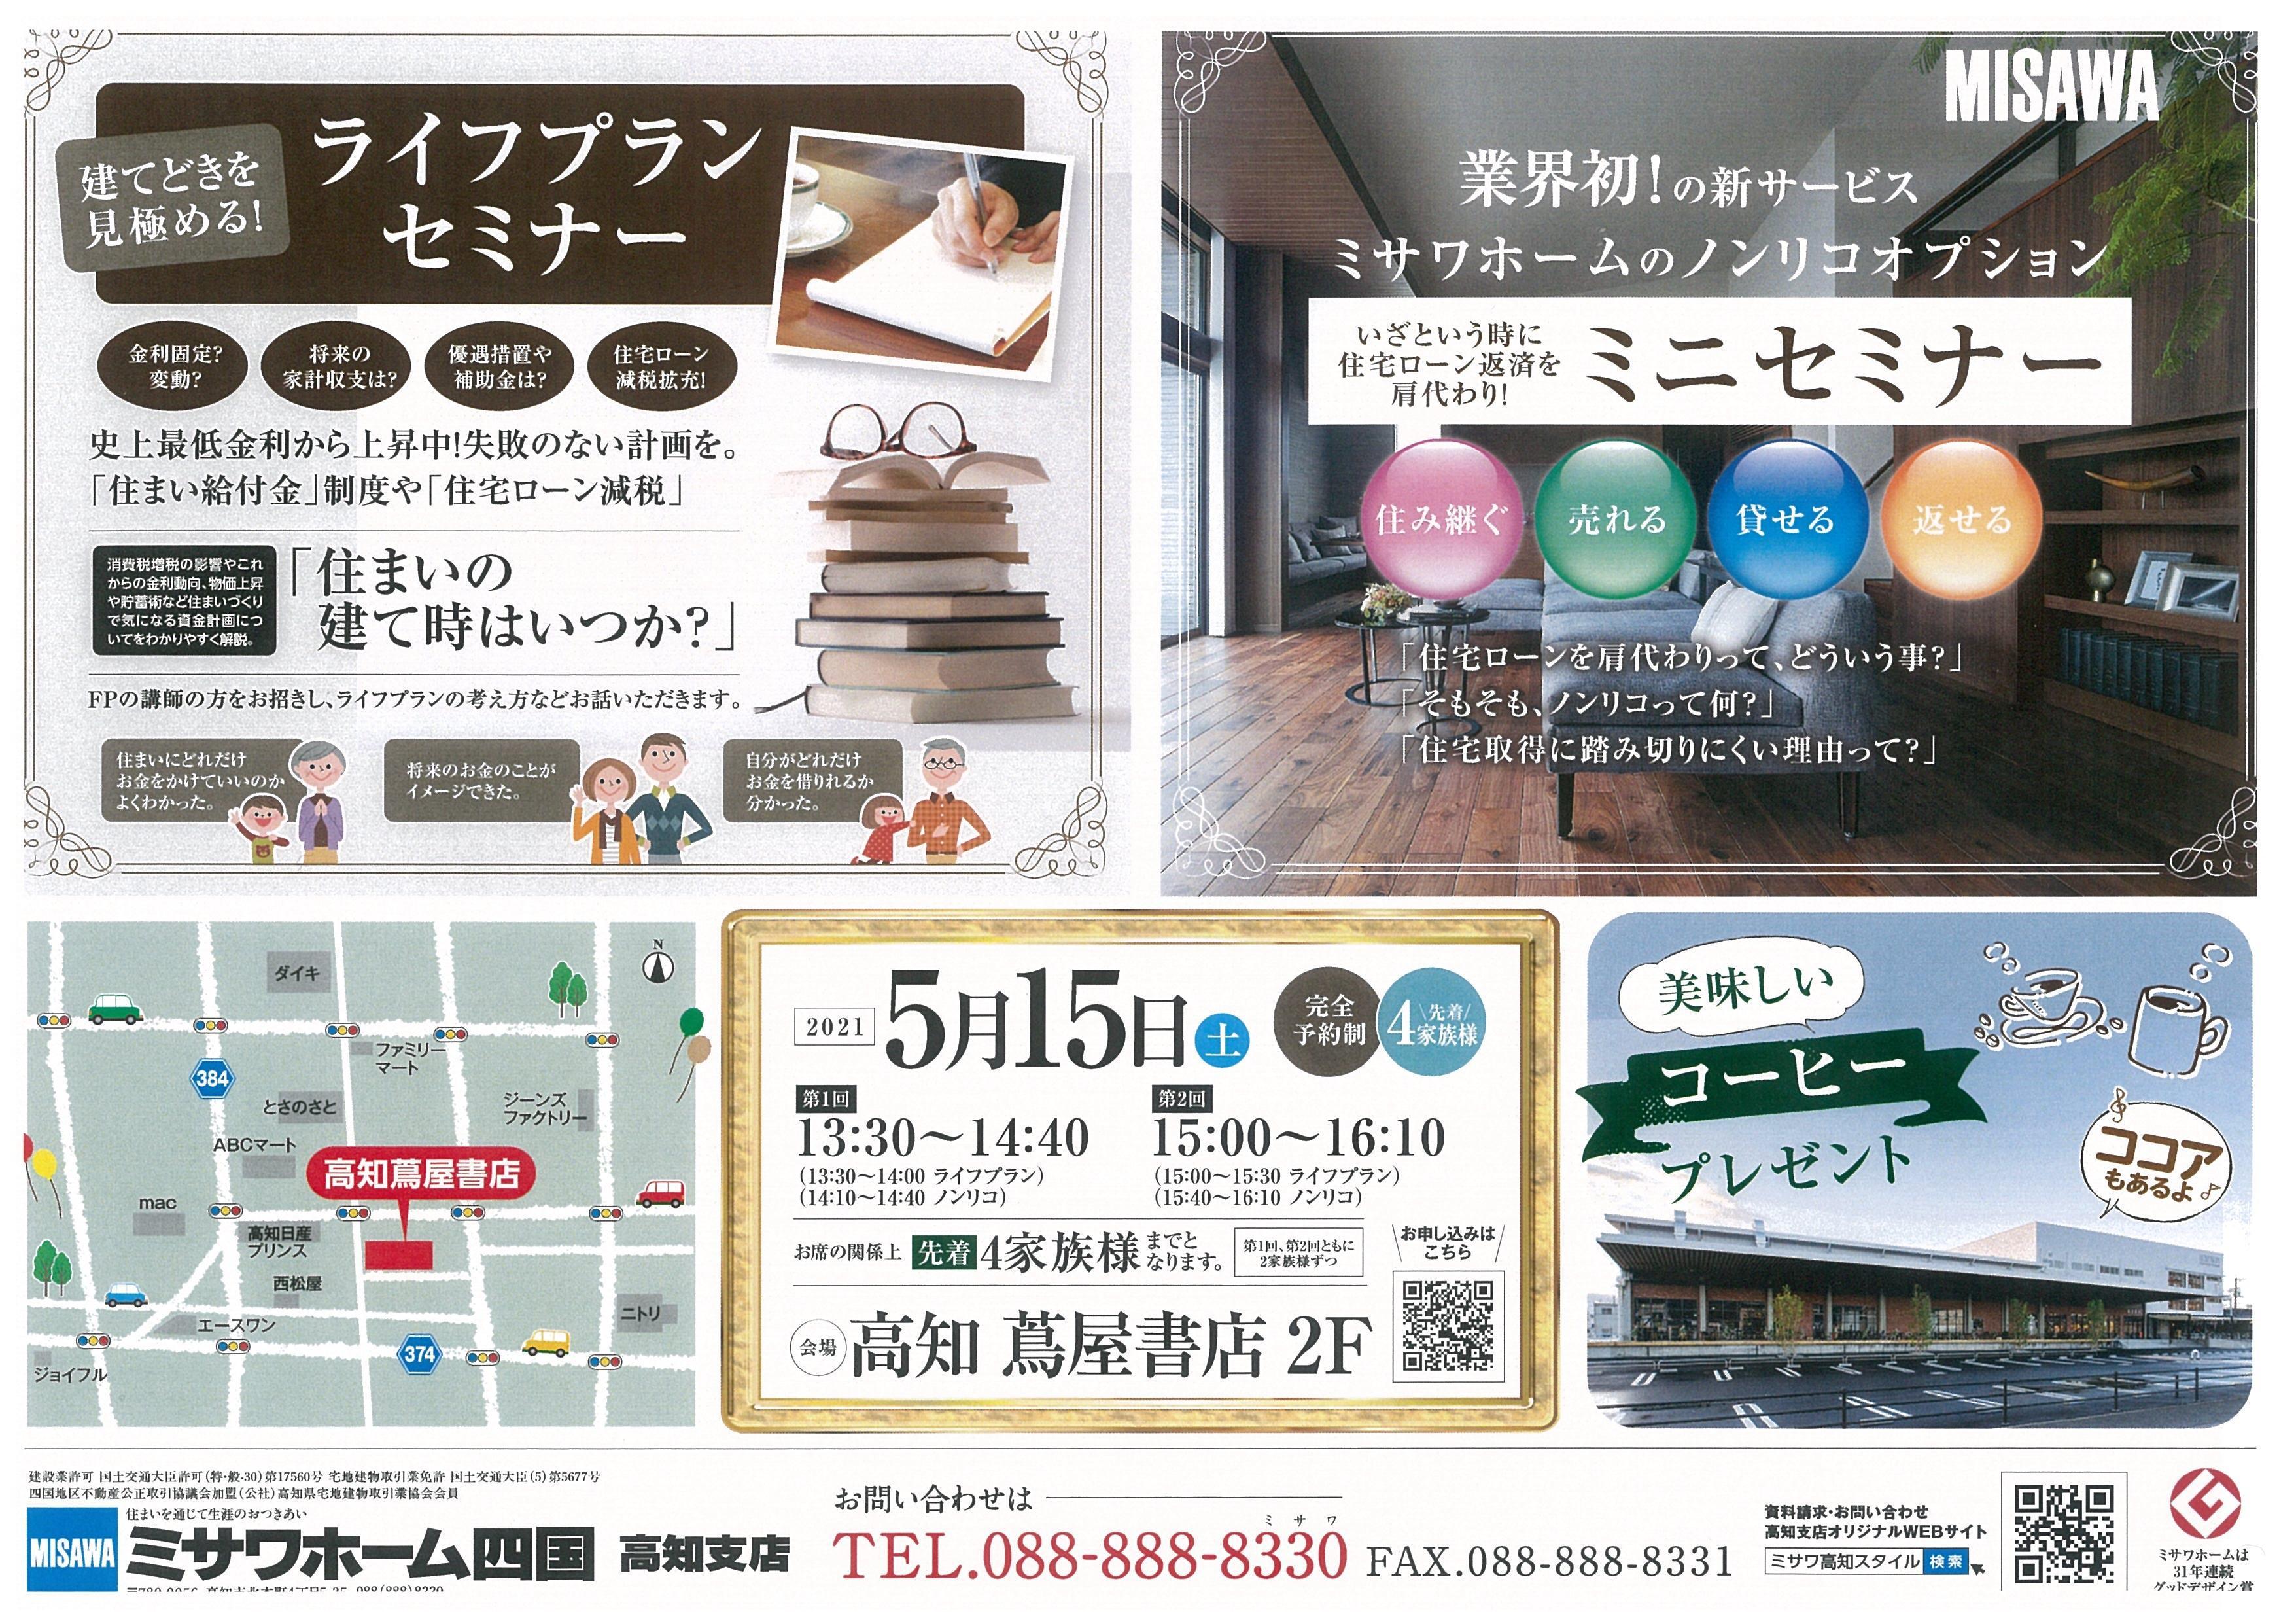 https://shikoku.misawa.co.jp/area_kouchi/20210510153037.jpg